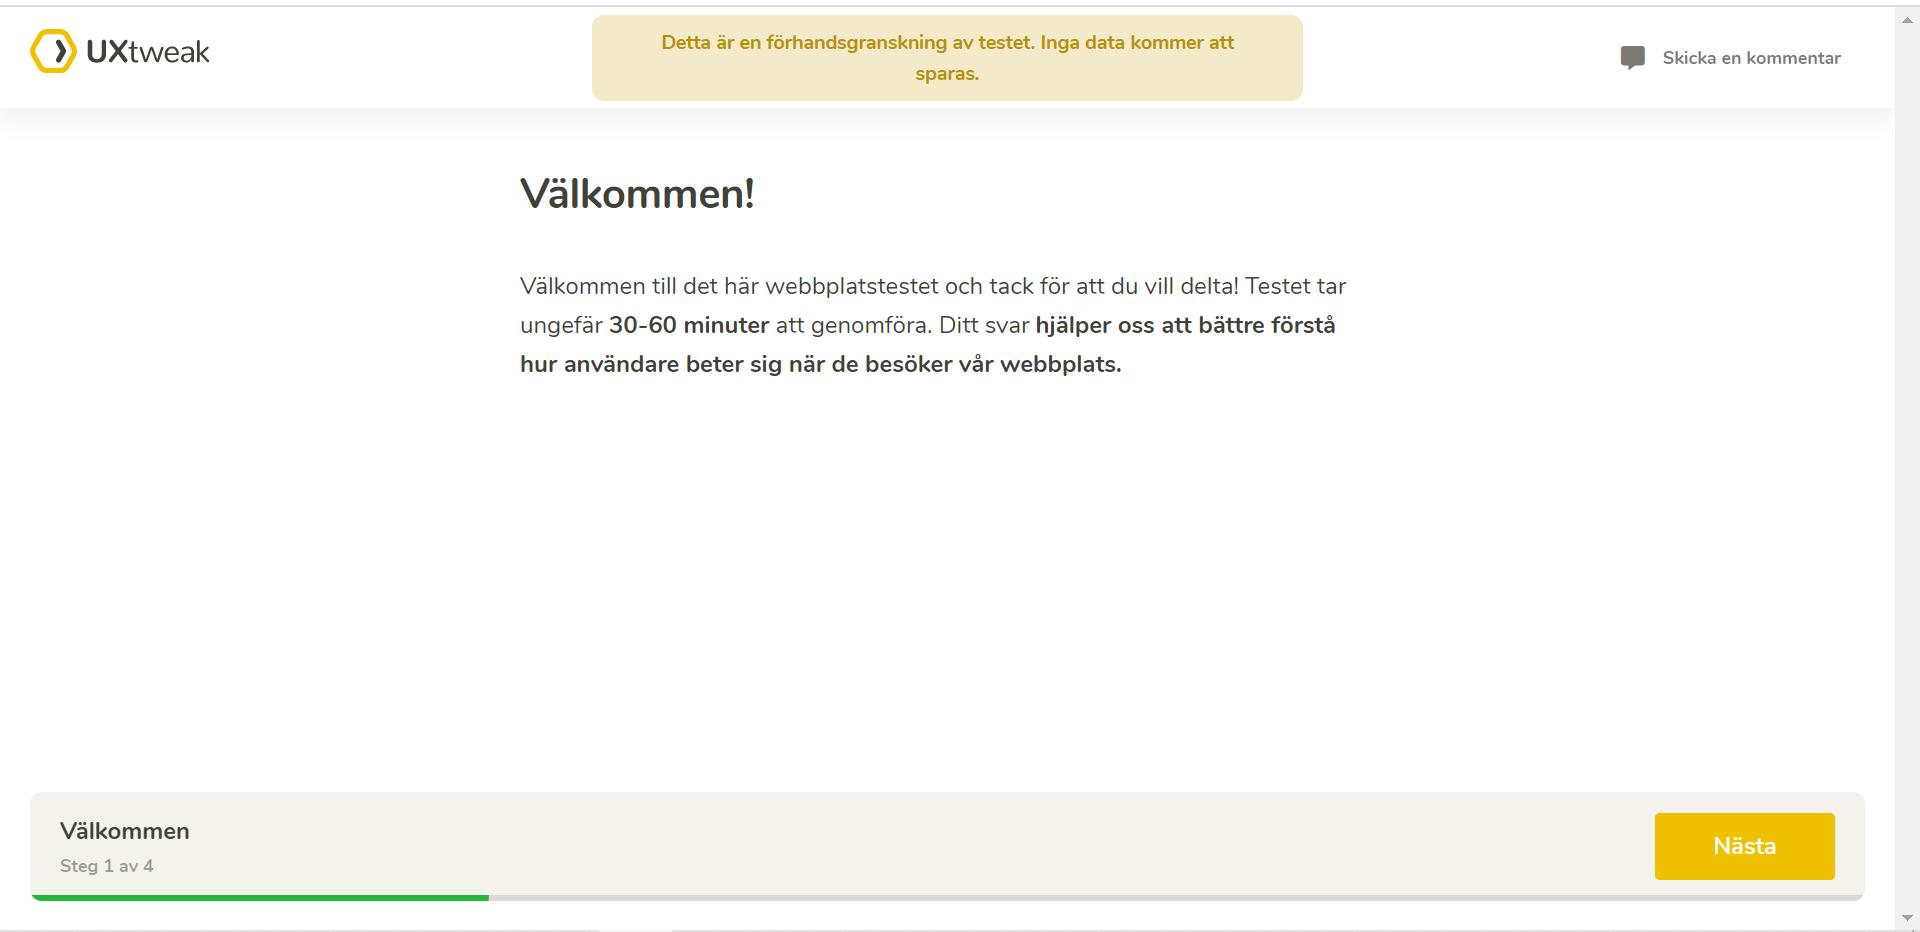 swedish language in UXtweak tools